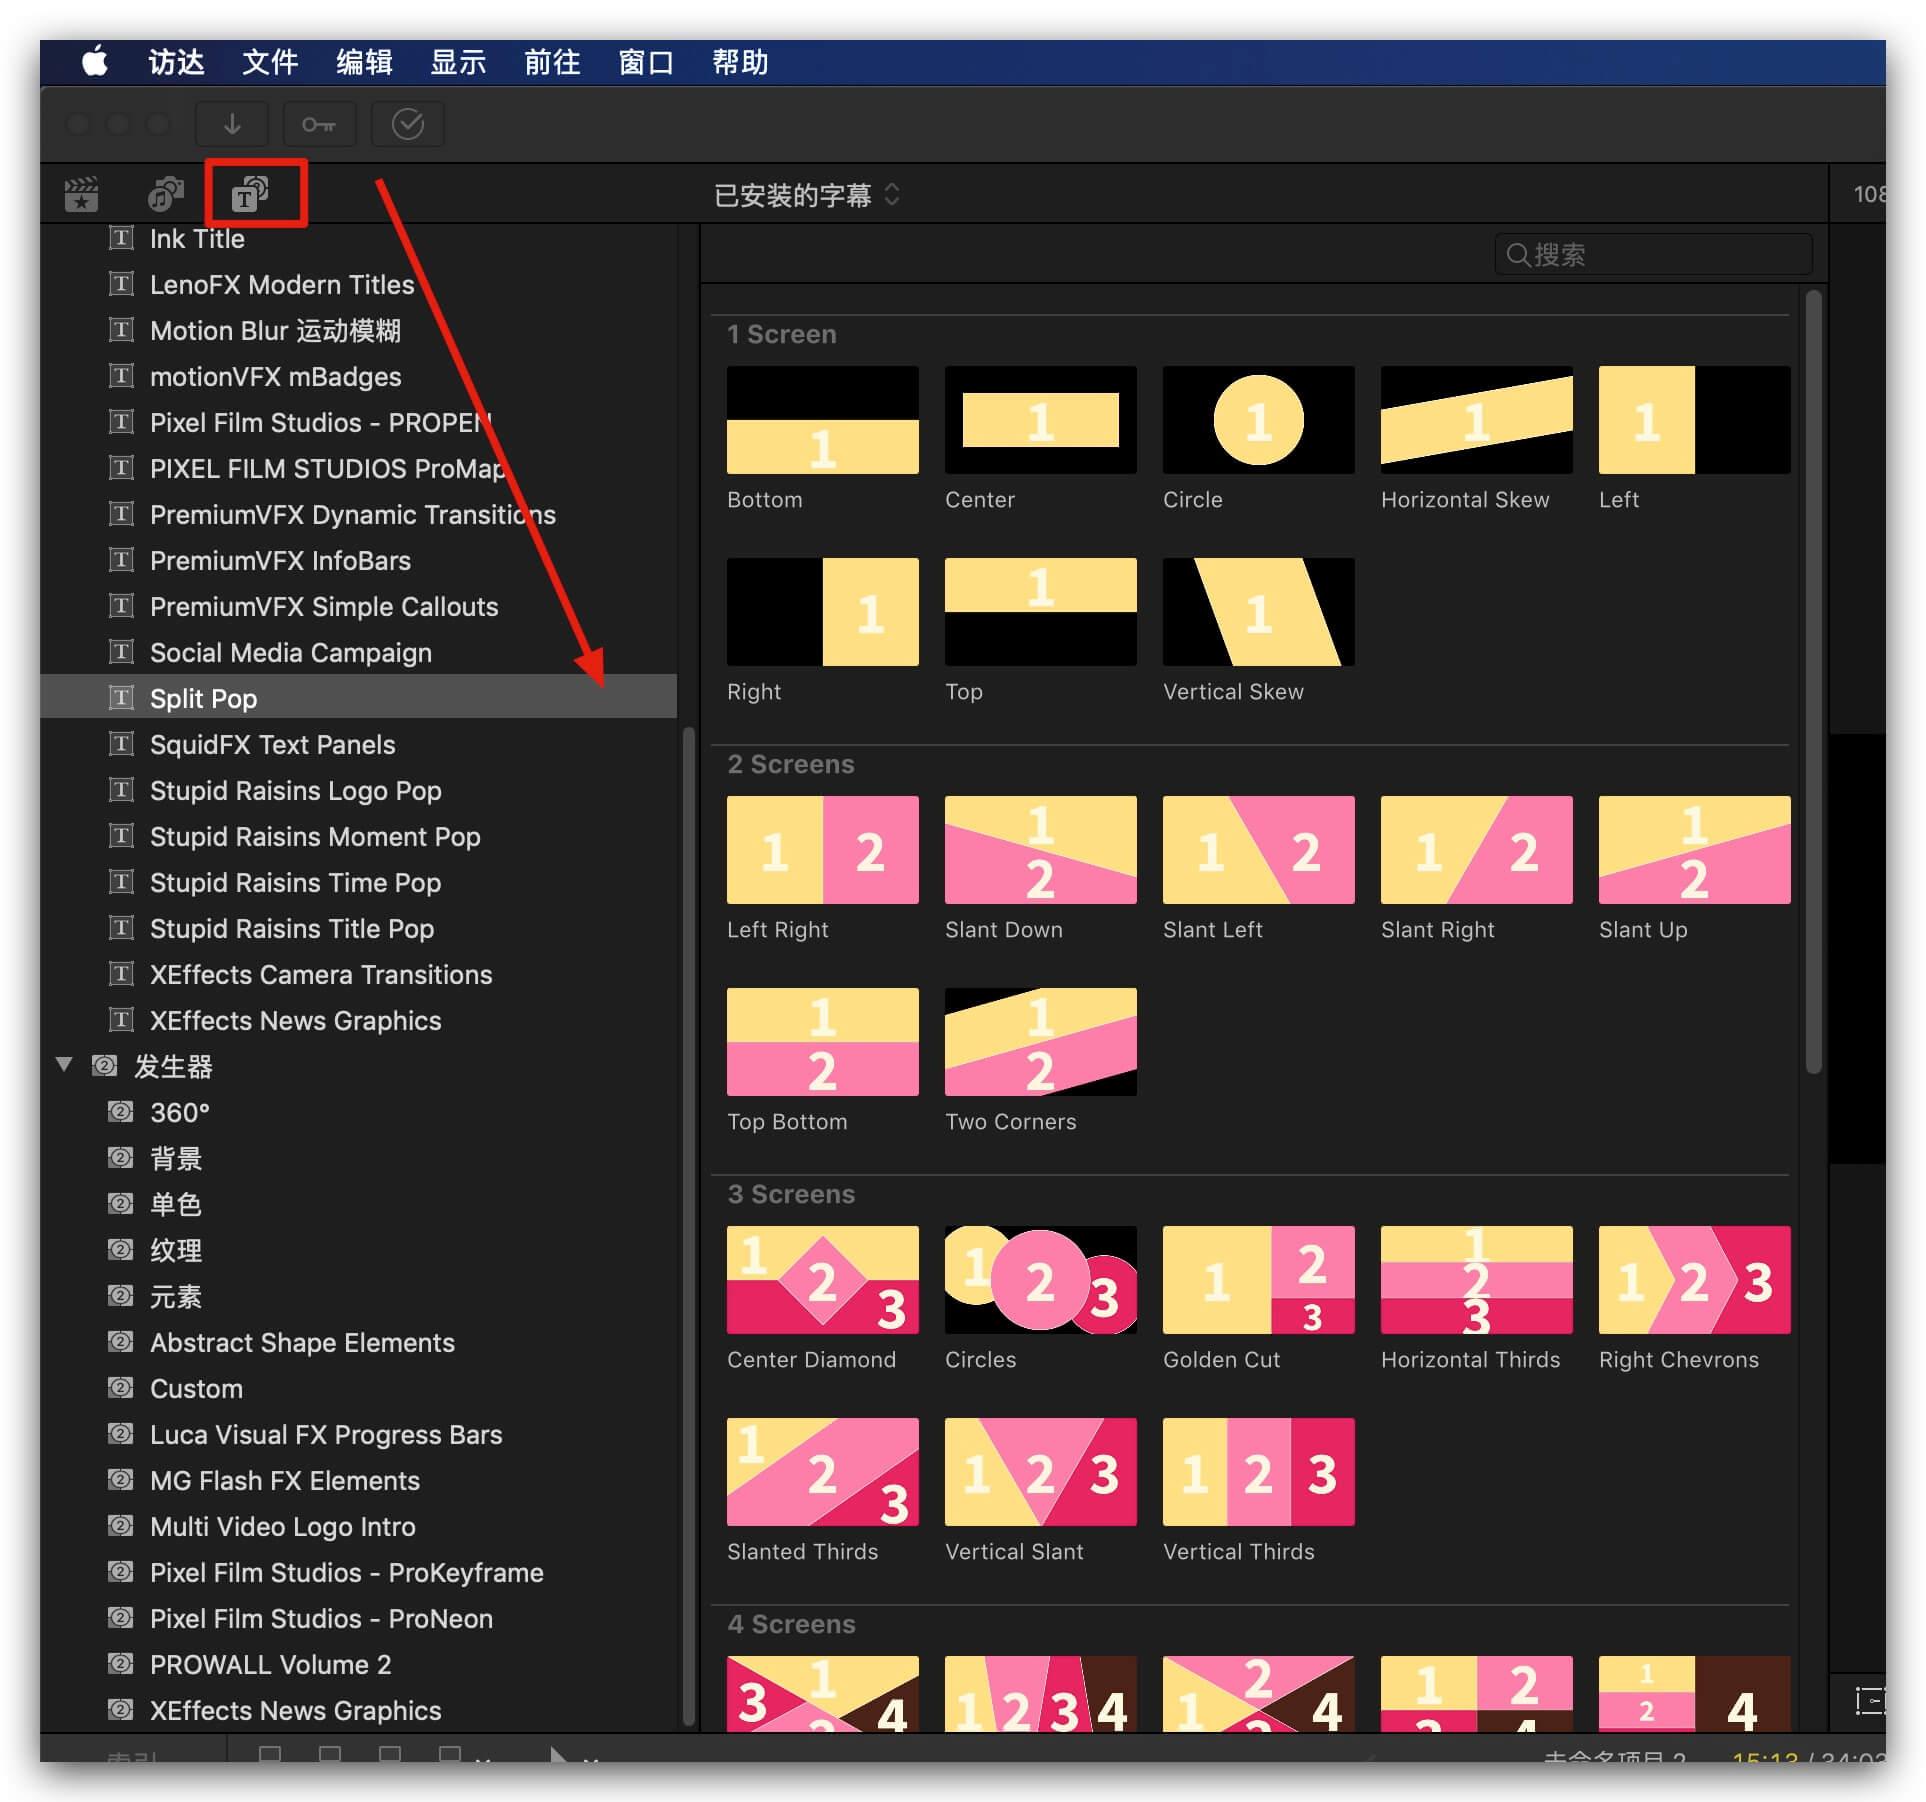 Fcpx分屏插件 41组视频分割可自定义分屏动画效果插件 可分9屏 Split Pop | MAC影视后期资源站